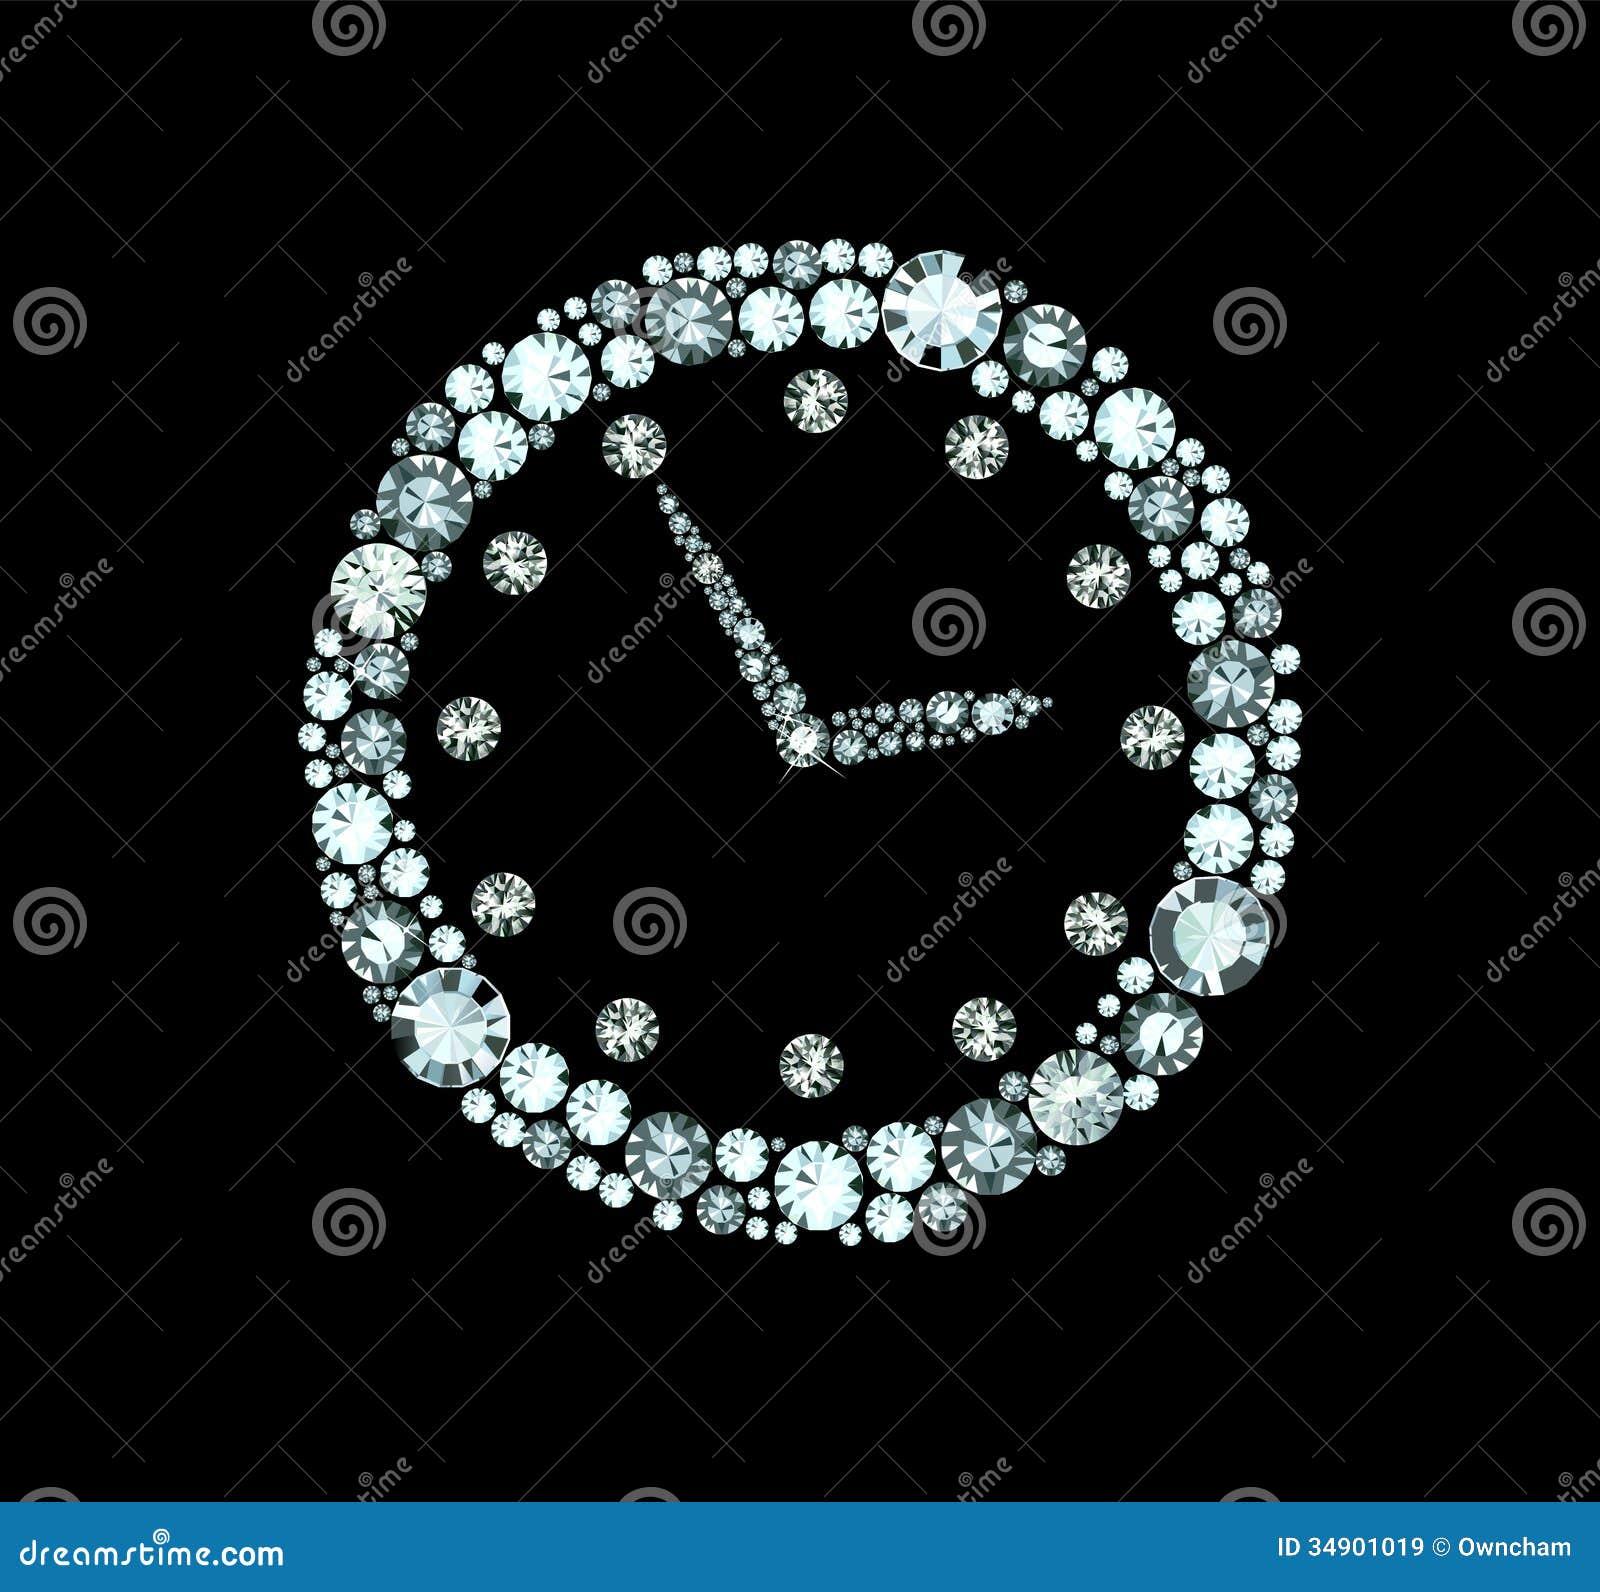 Diamond Clock Royalty Free Stock Images Image 34901019